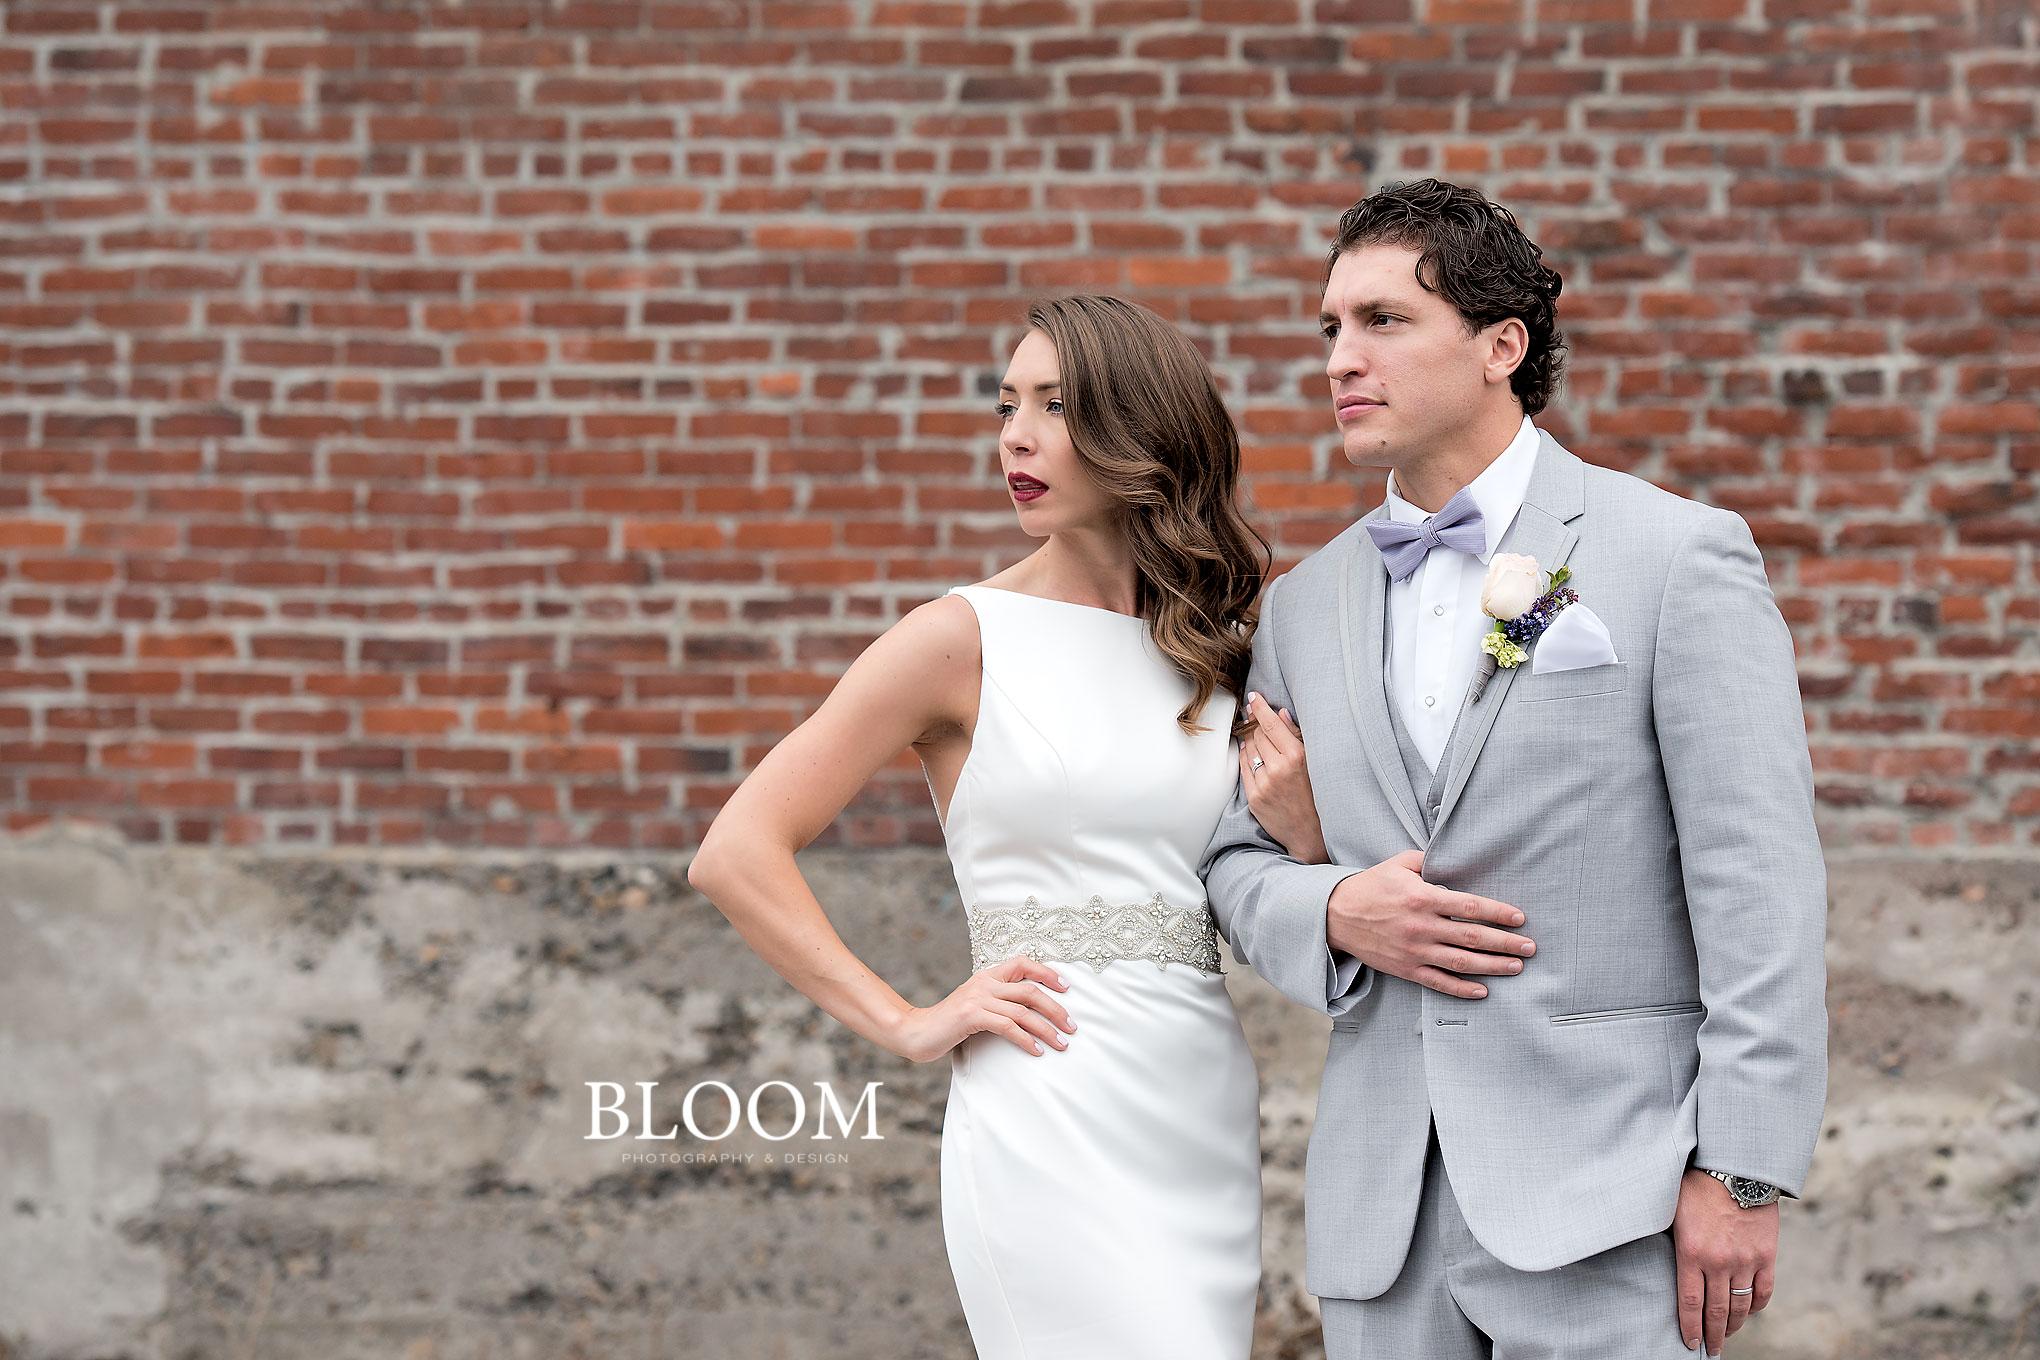 portlan_oregon_wedding_san_antonio_photographer_bloom_102316_NMM_7140.jpg